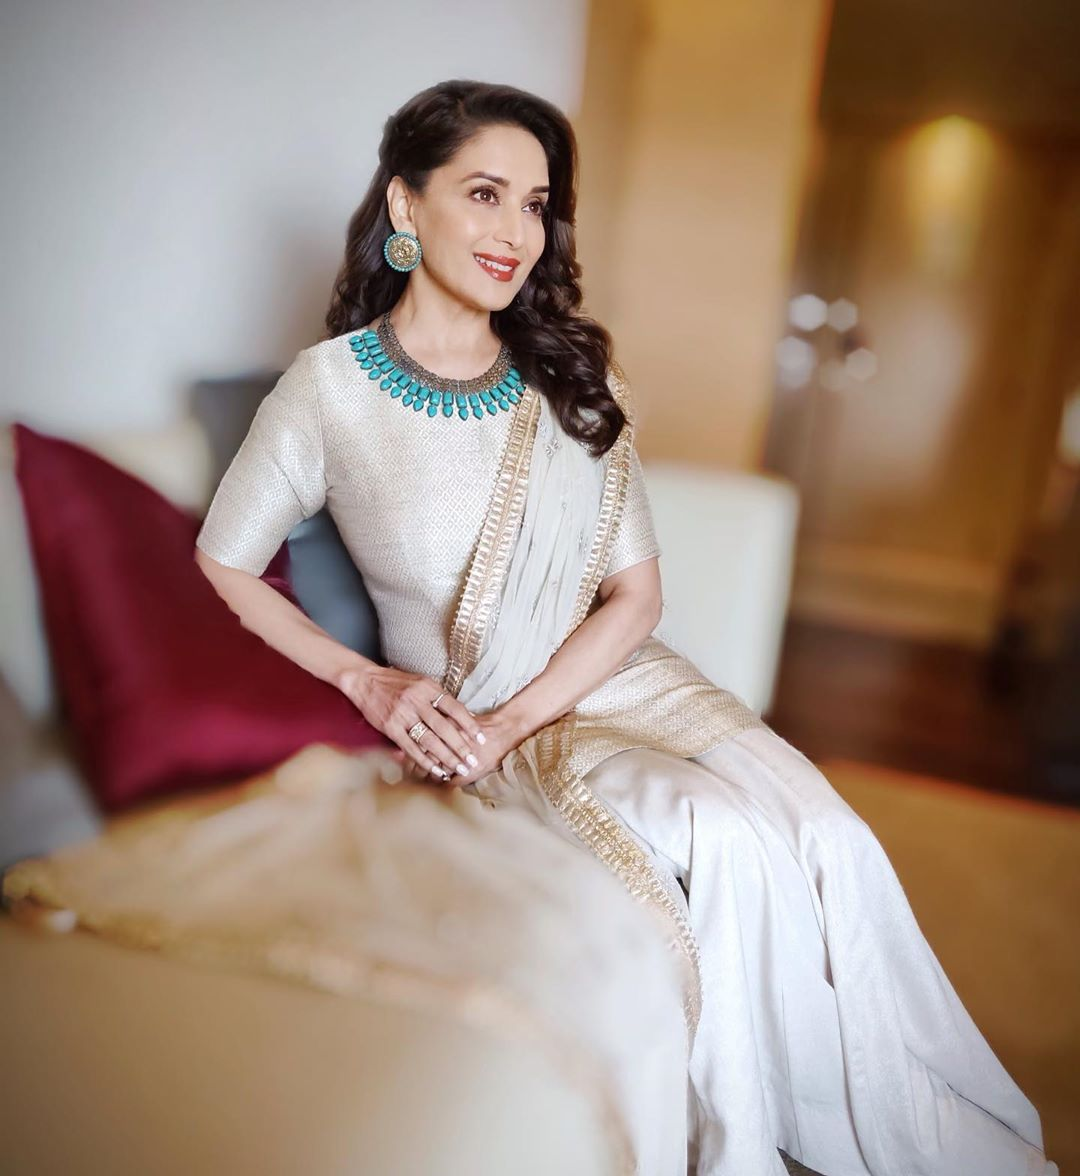 Bollywood Tadka, madhuri dixit hd wallpaper,madhuri dixit ka photo,madhuri dixit hd photo,madhuri dixit ki,माधुरी , माधुरी दीक्षित फोटो, माधुरी दीक्षित पिक्चर